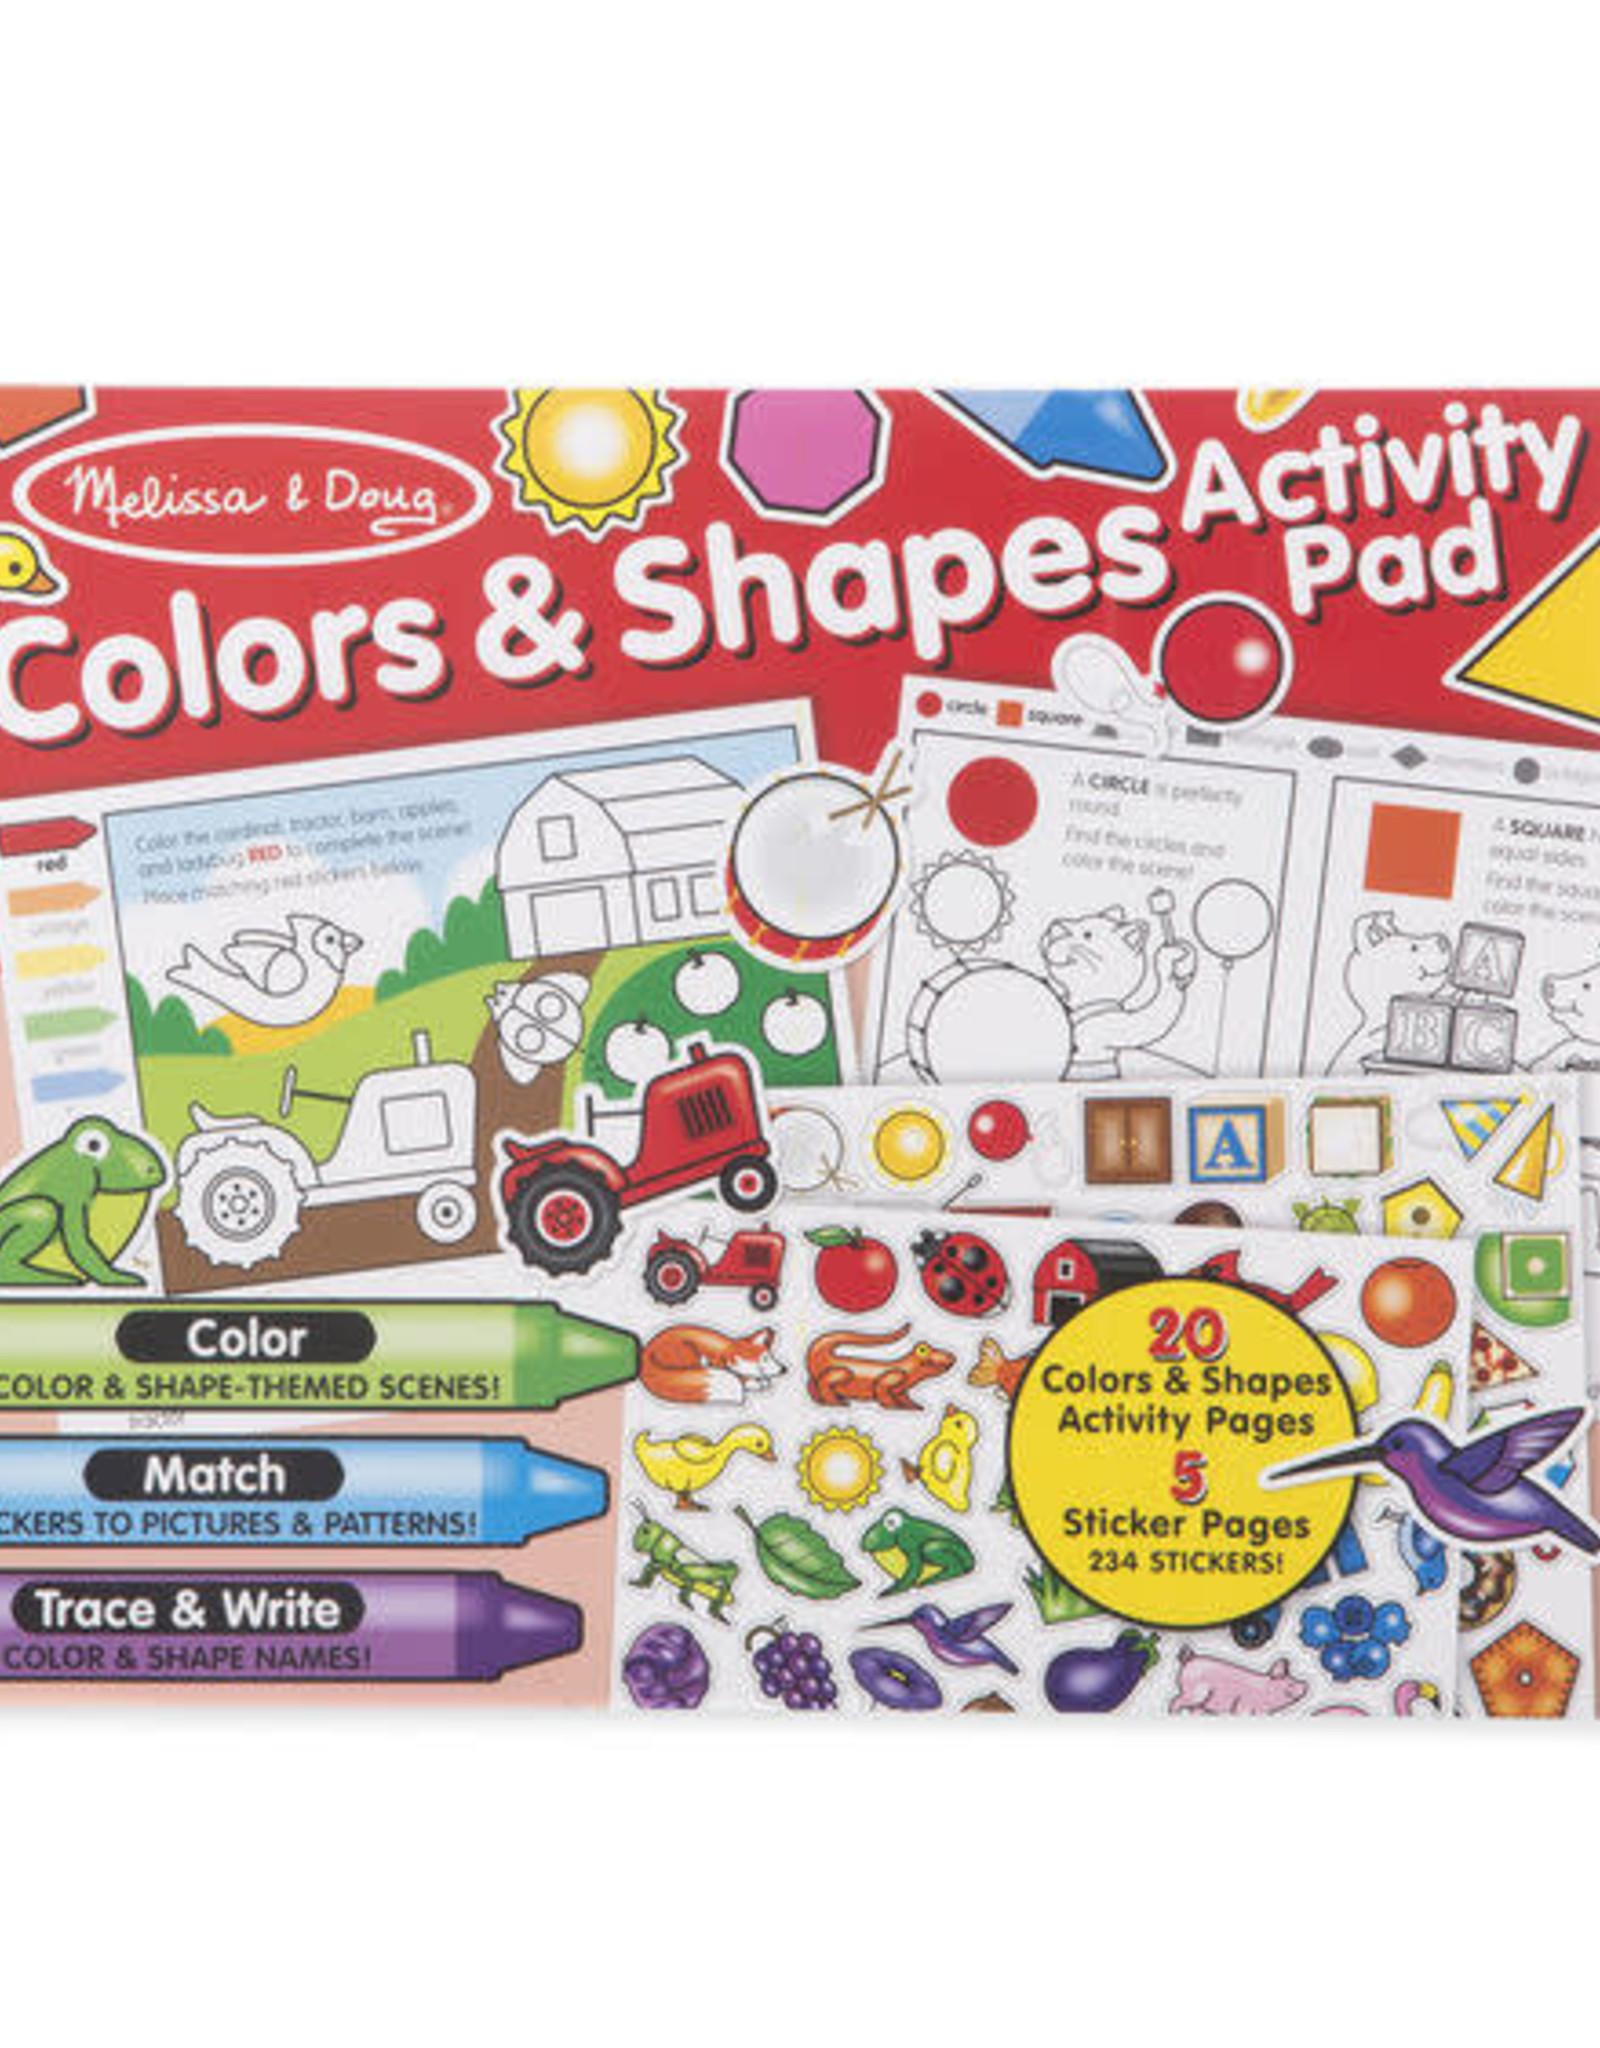 Melissa & Doug Melissa & Doug Colors & Shapes Activity Pad